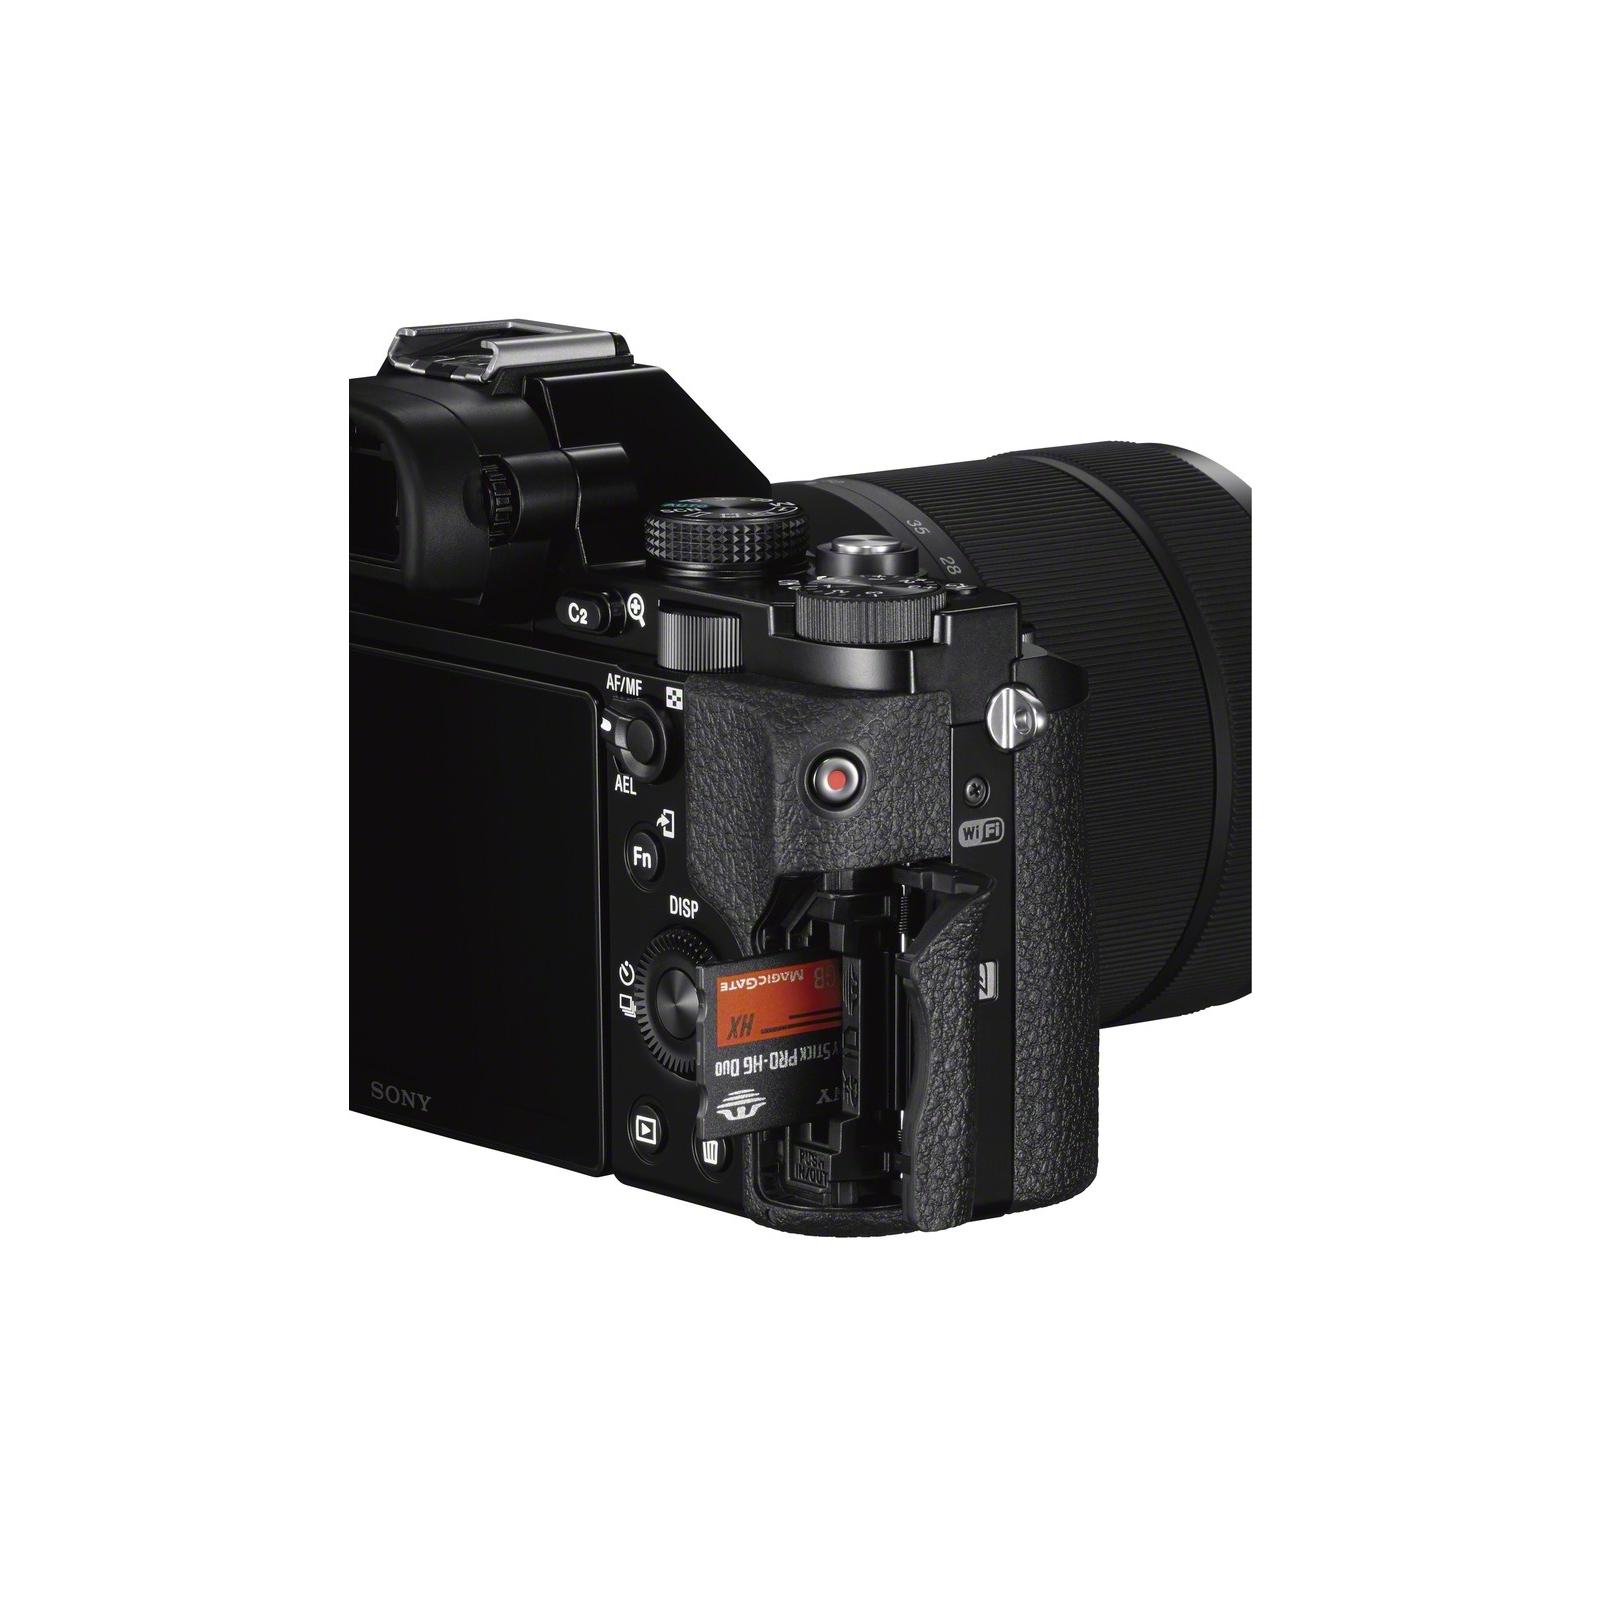 Цифровой фотоаппарат SONY Alpha 7 body black (ILCE7B.RU2) изображение 8